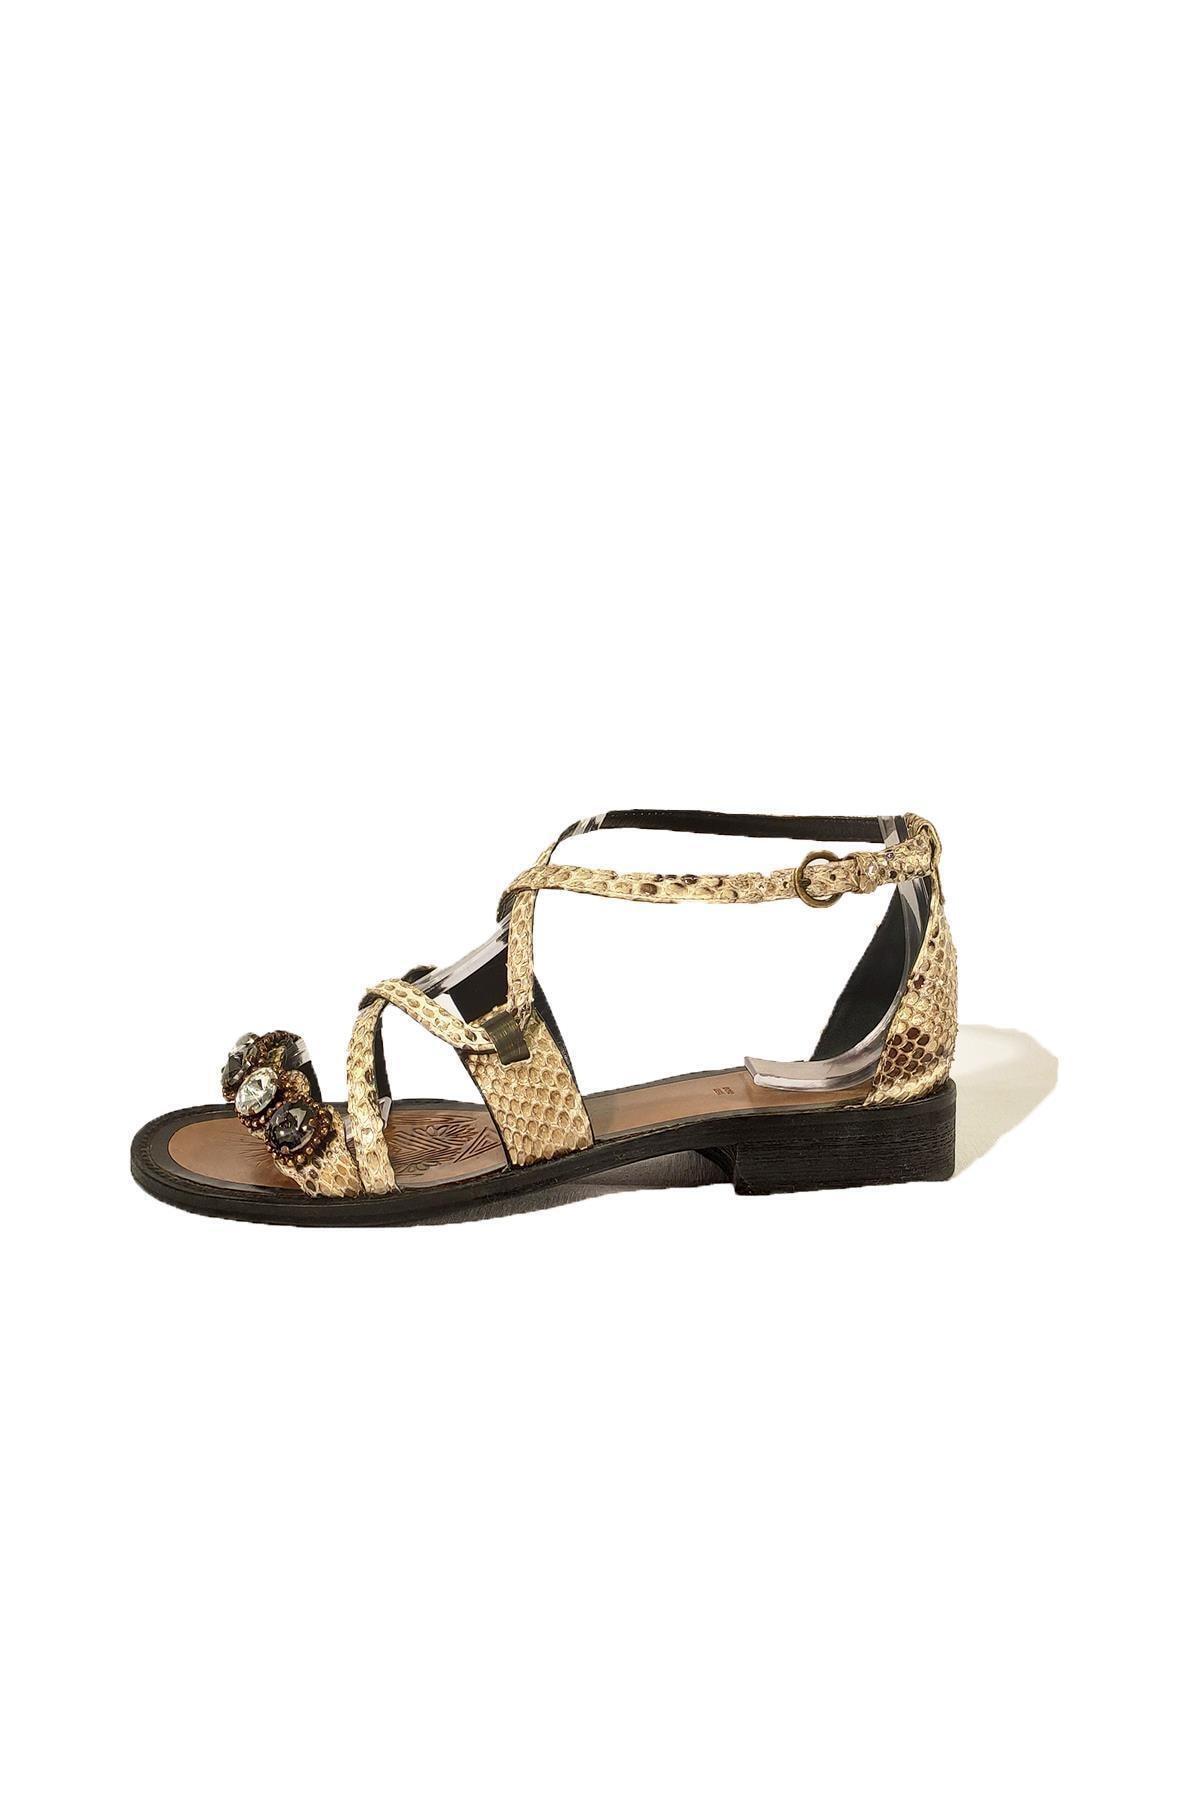 Nursace Hakiki Deri Sandalet Nsc19y-a08248 2